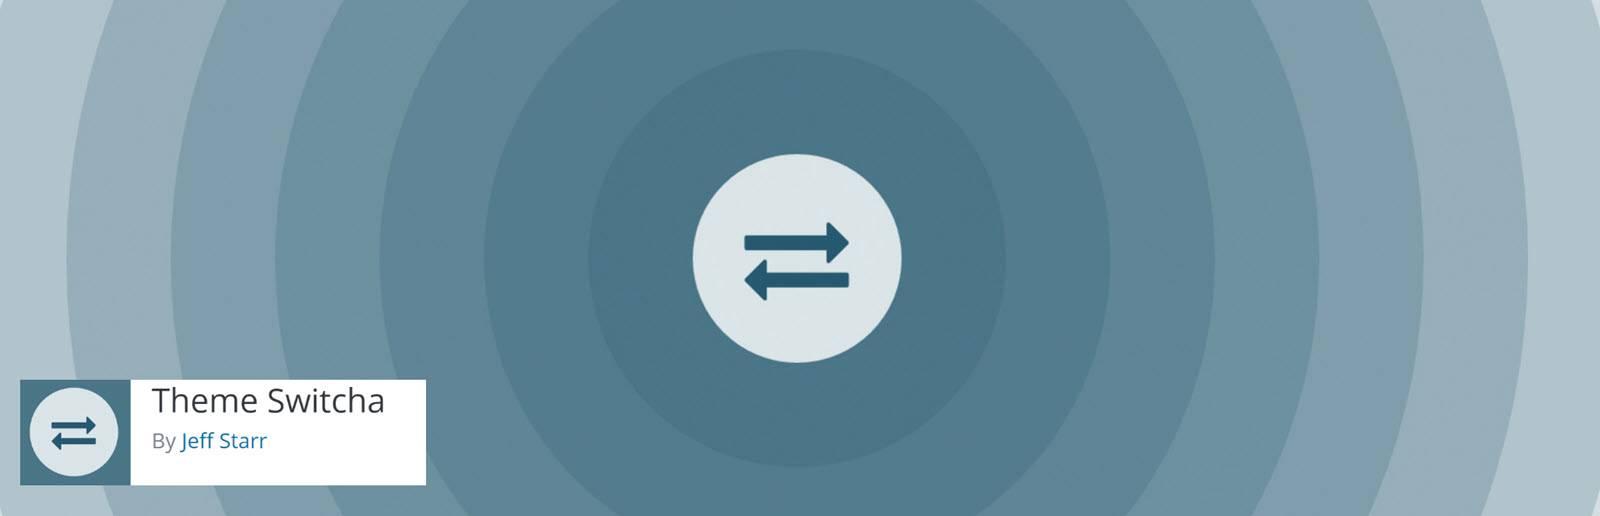 Theme Switcha - Best WordPress Plugins for Developers